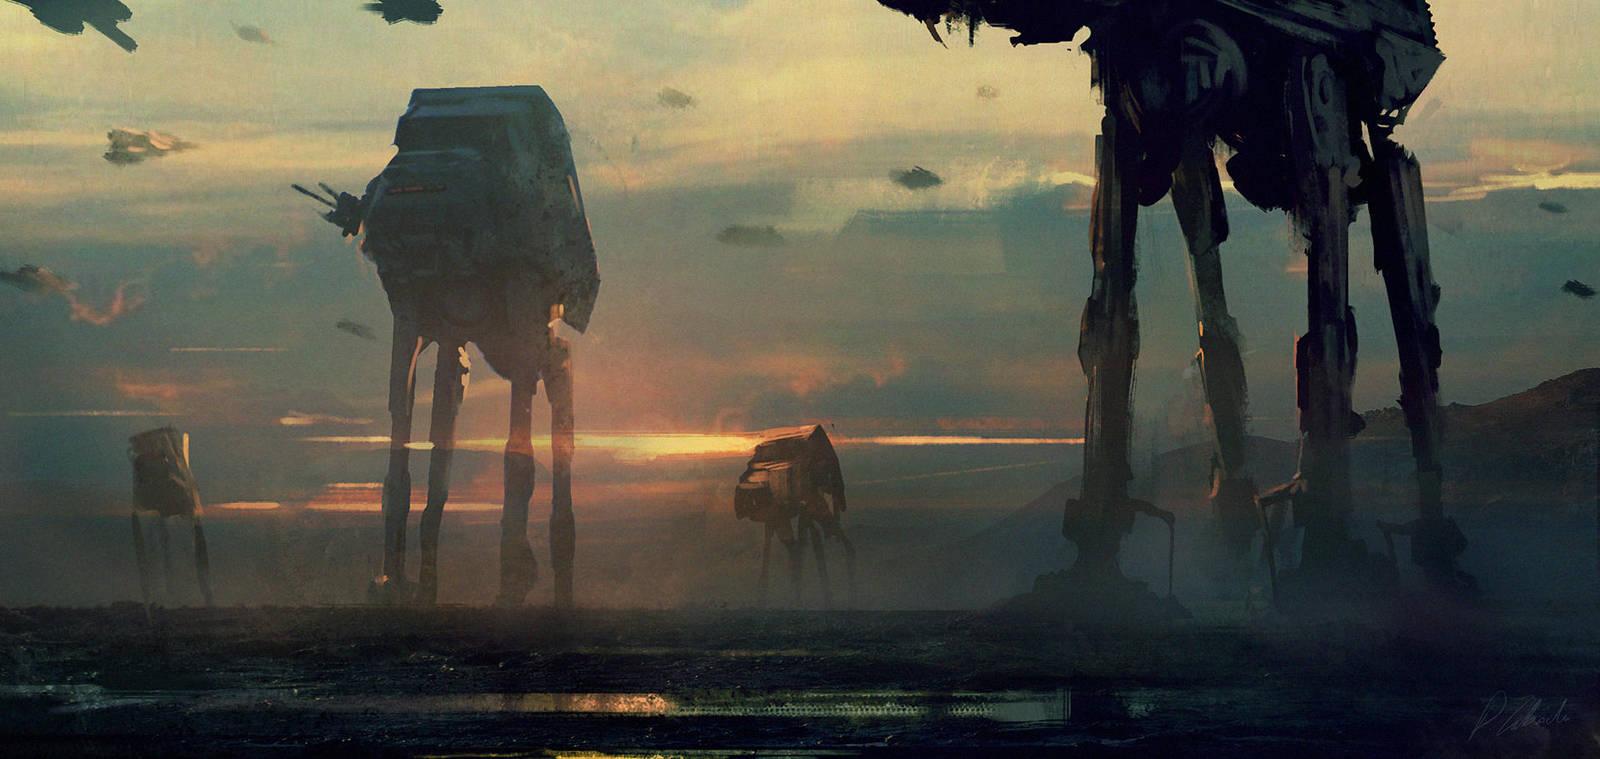 Imperial Walkers by daRoz